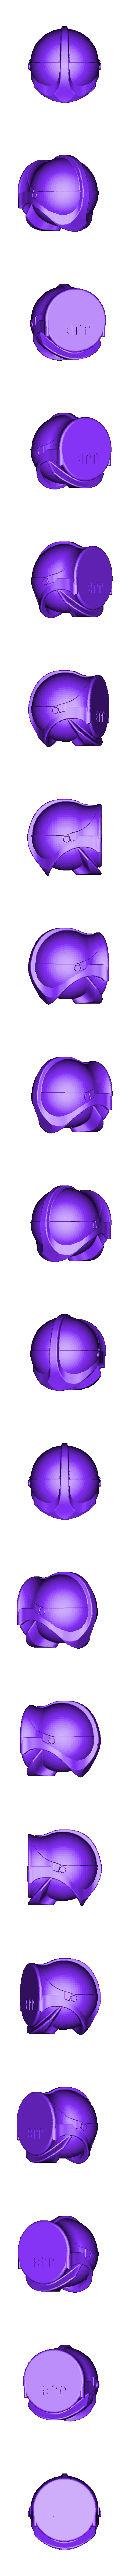 Casque SPF1 bloc.stl Download STL file Firefighter helmet SPF1 • 3D print model, JJB